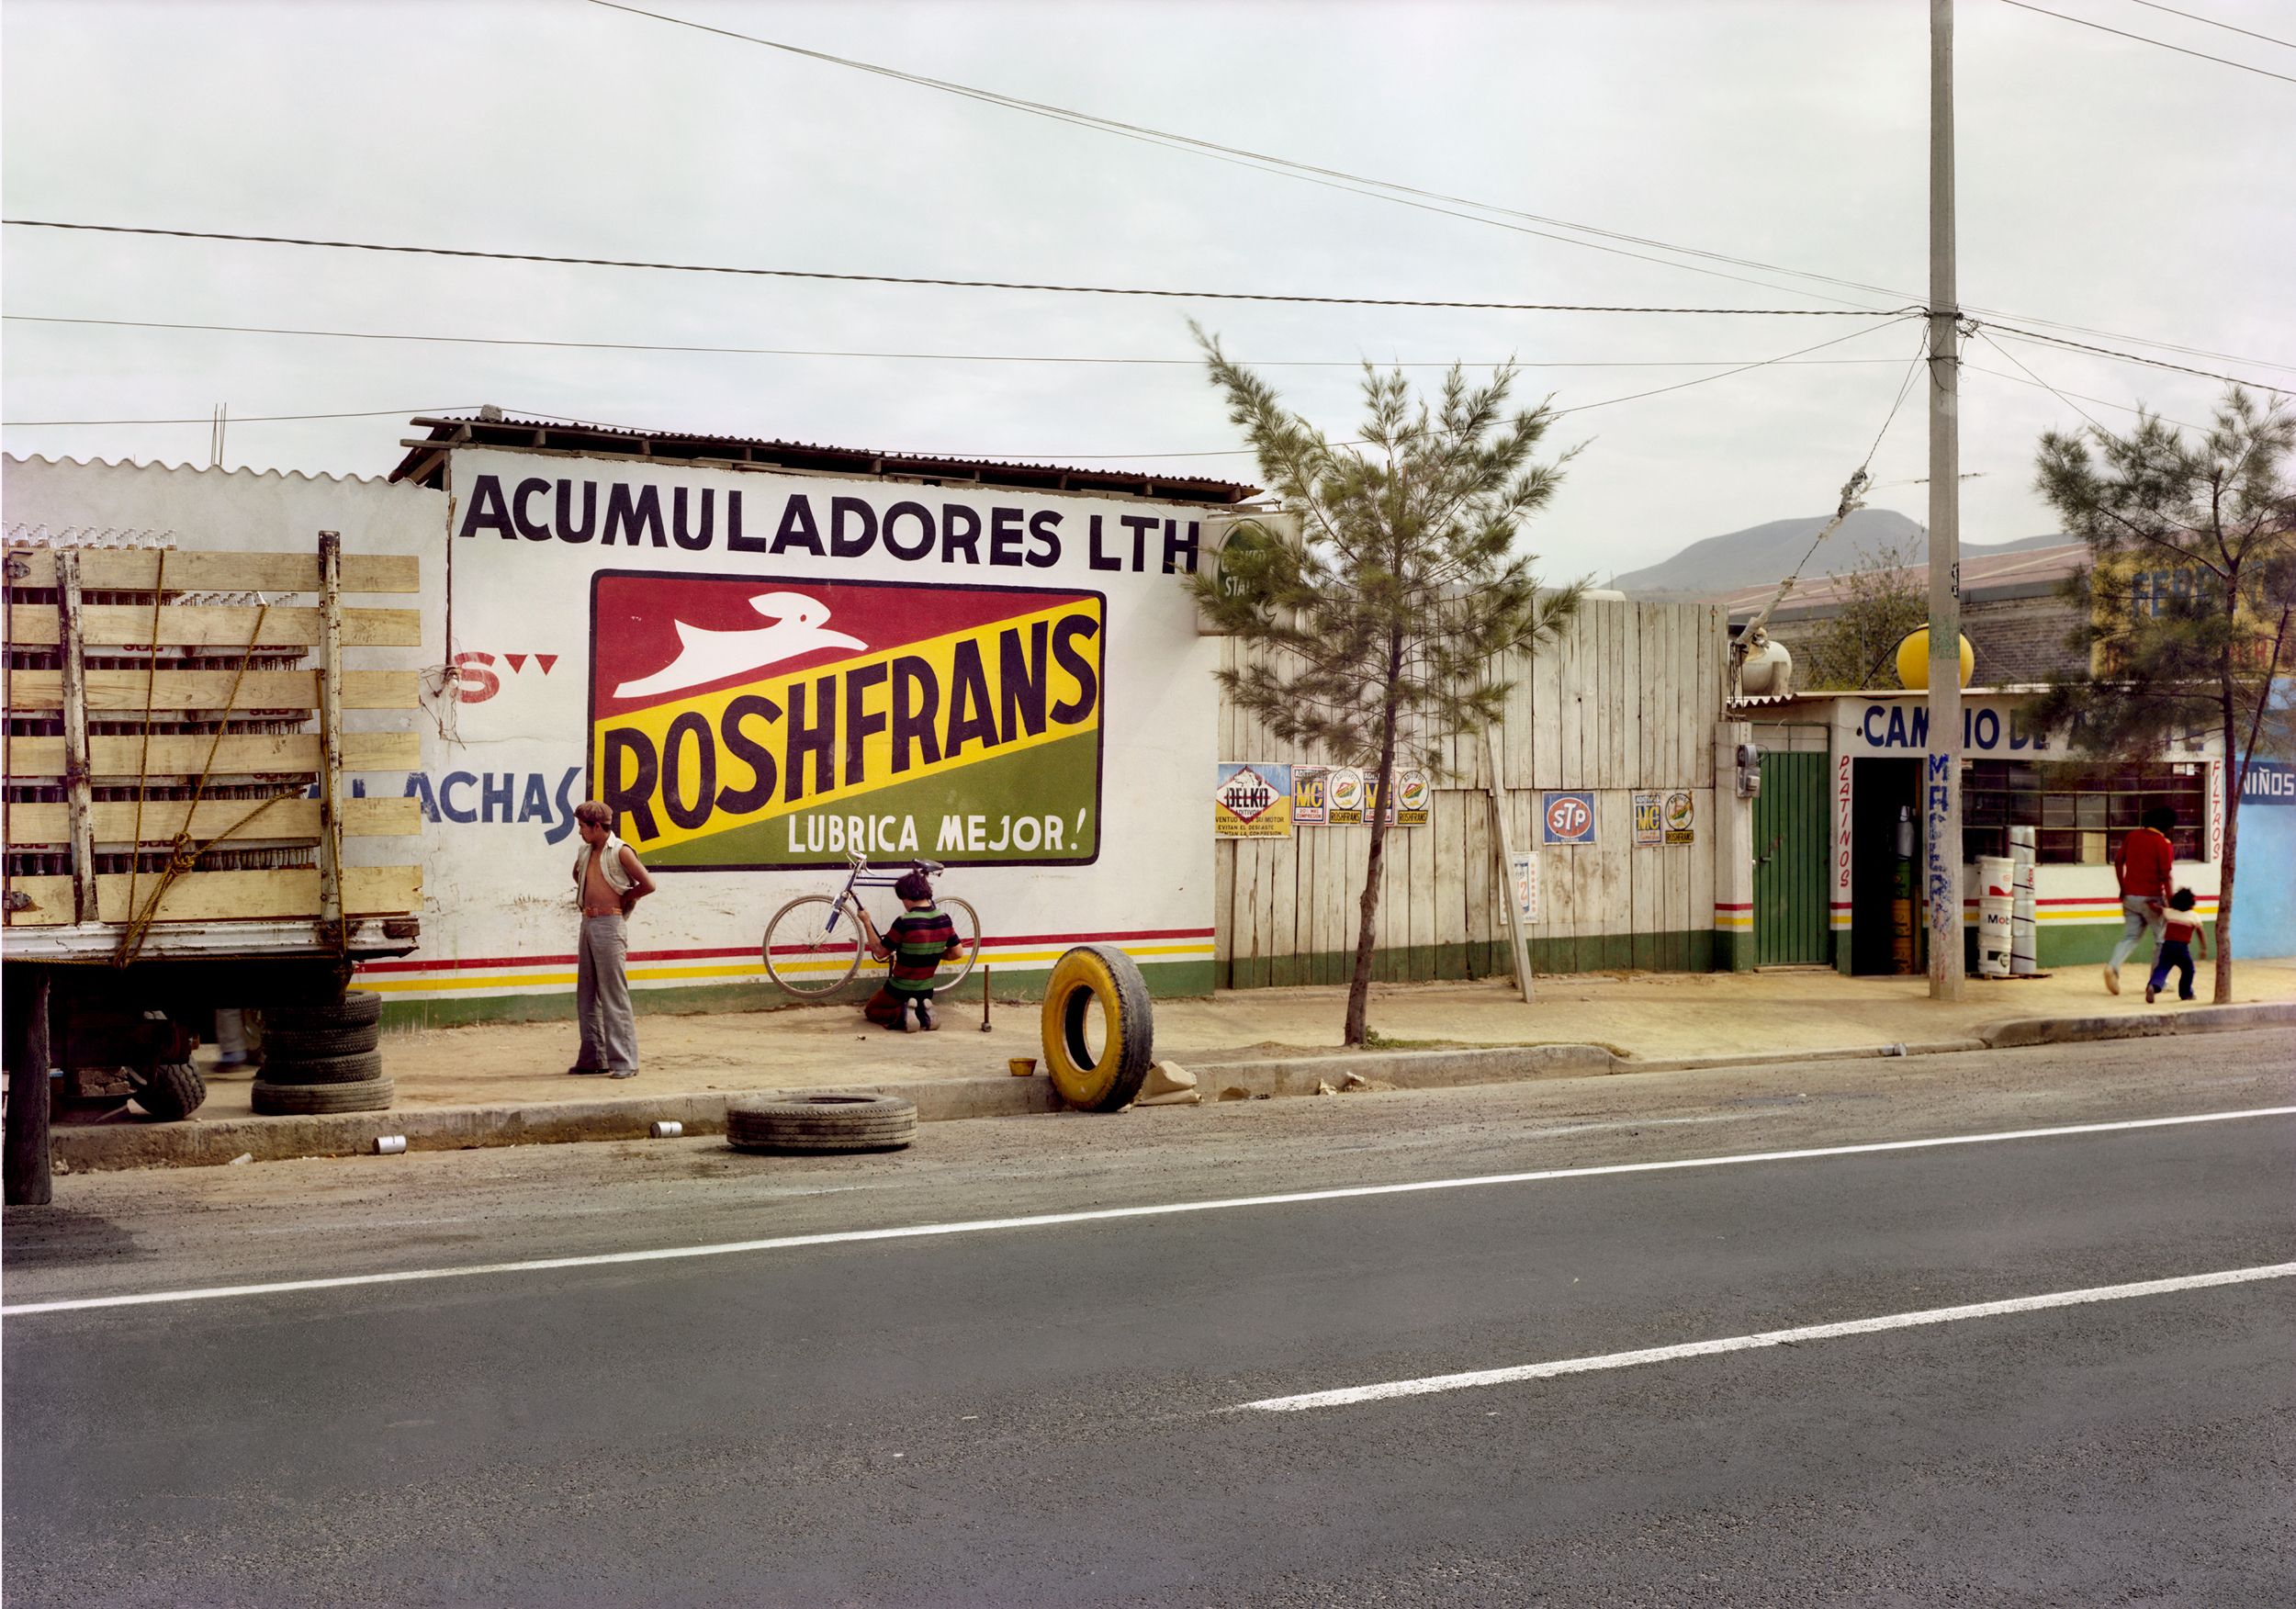 Roshfrans.jpg